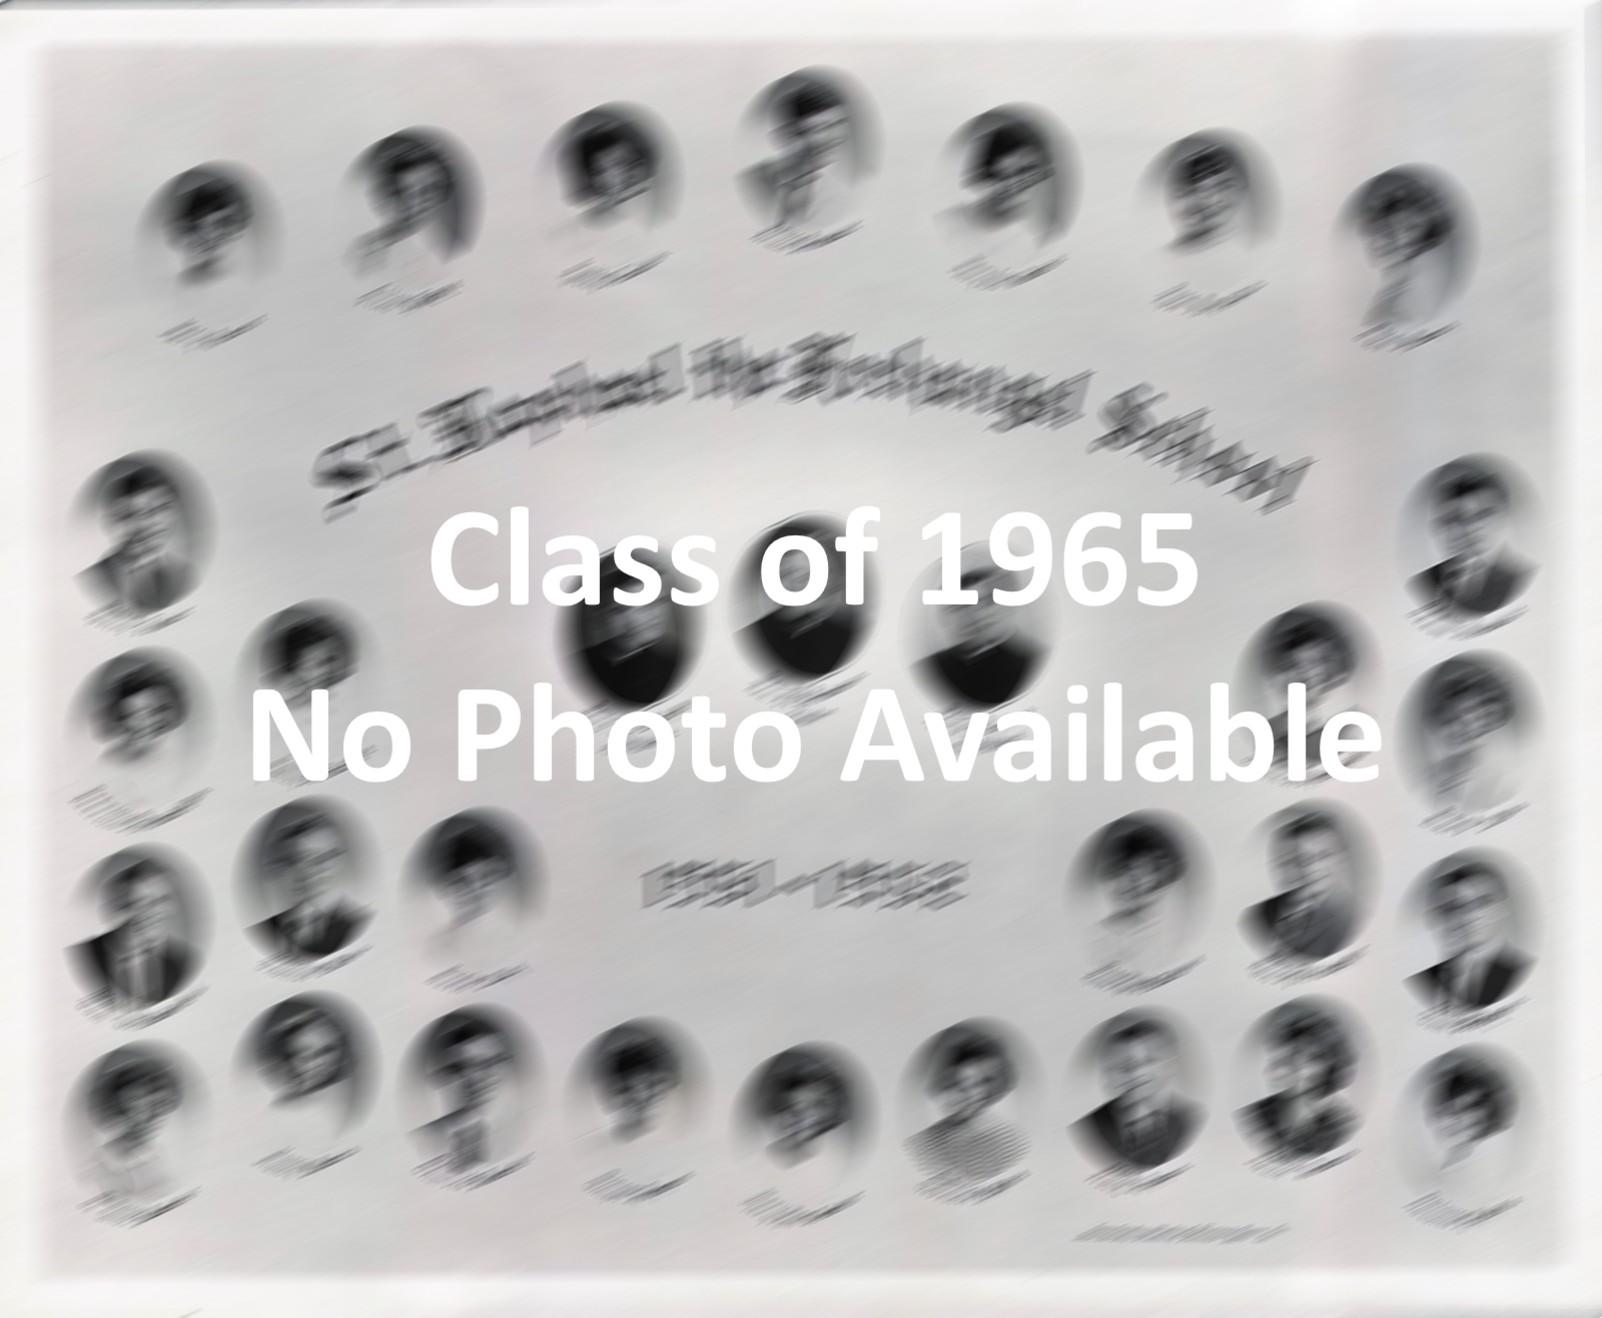 Graduation Class of 1965